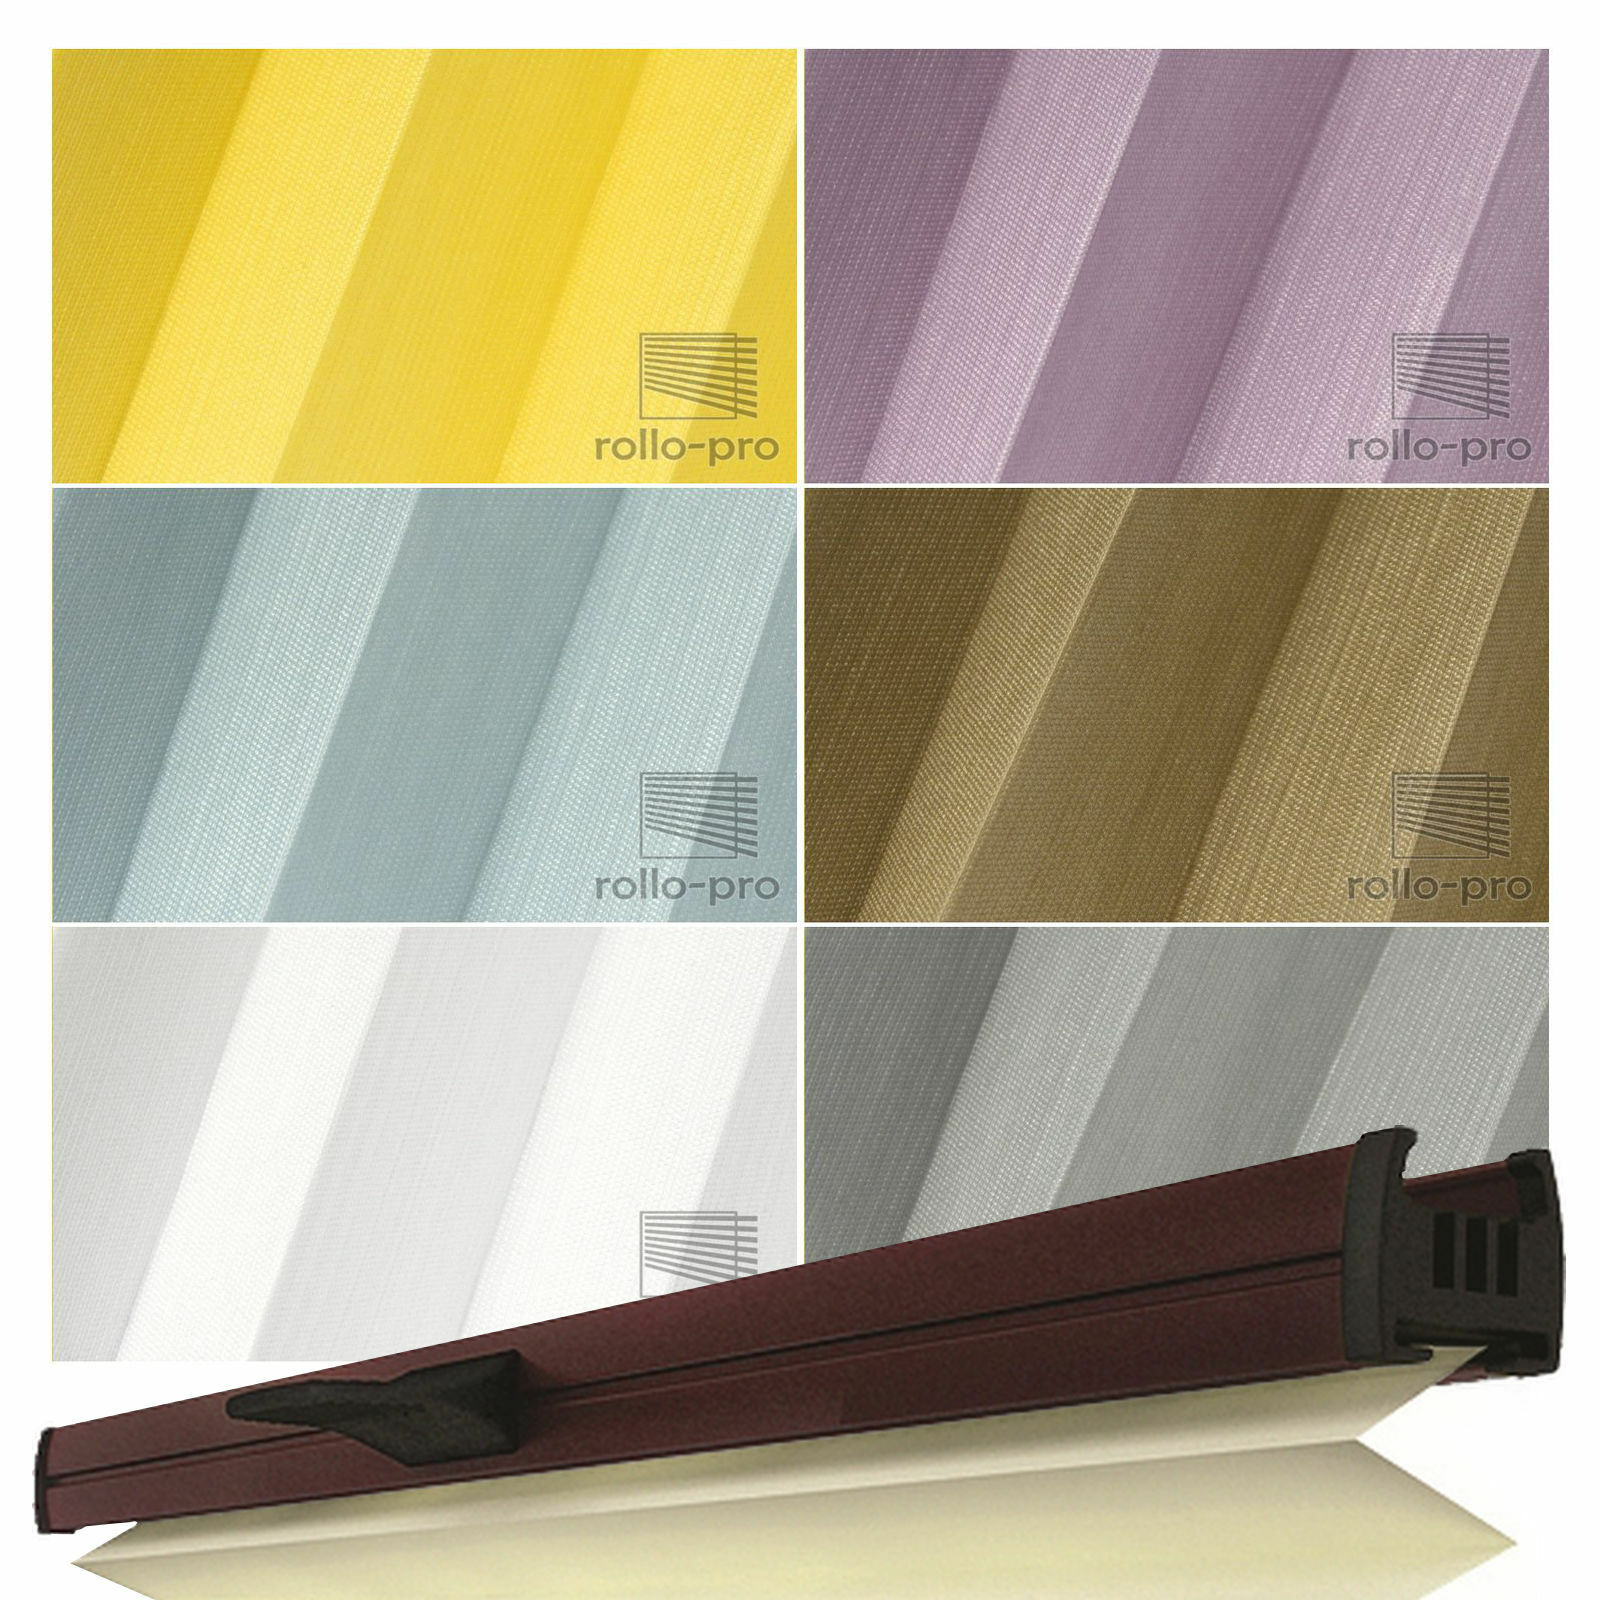 Plissee Faltrollo ohne Bohren Faltstore nach Maß   Klemmfix Klemmfix Klemmfix  KALA  Profil  Braun | König der Quantität  76e2d9